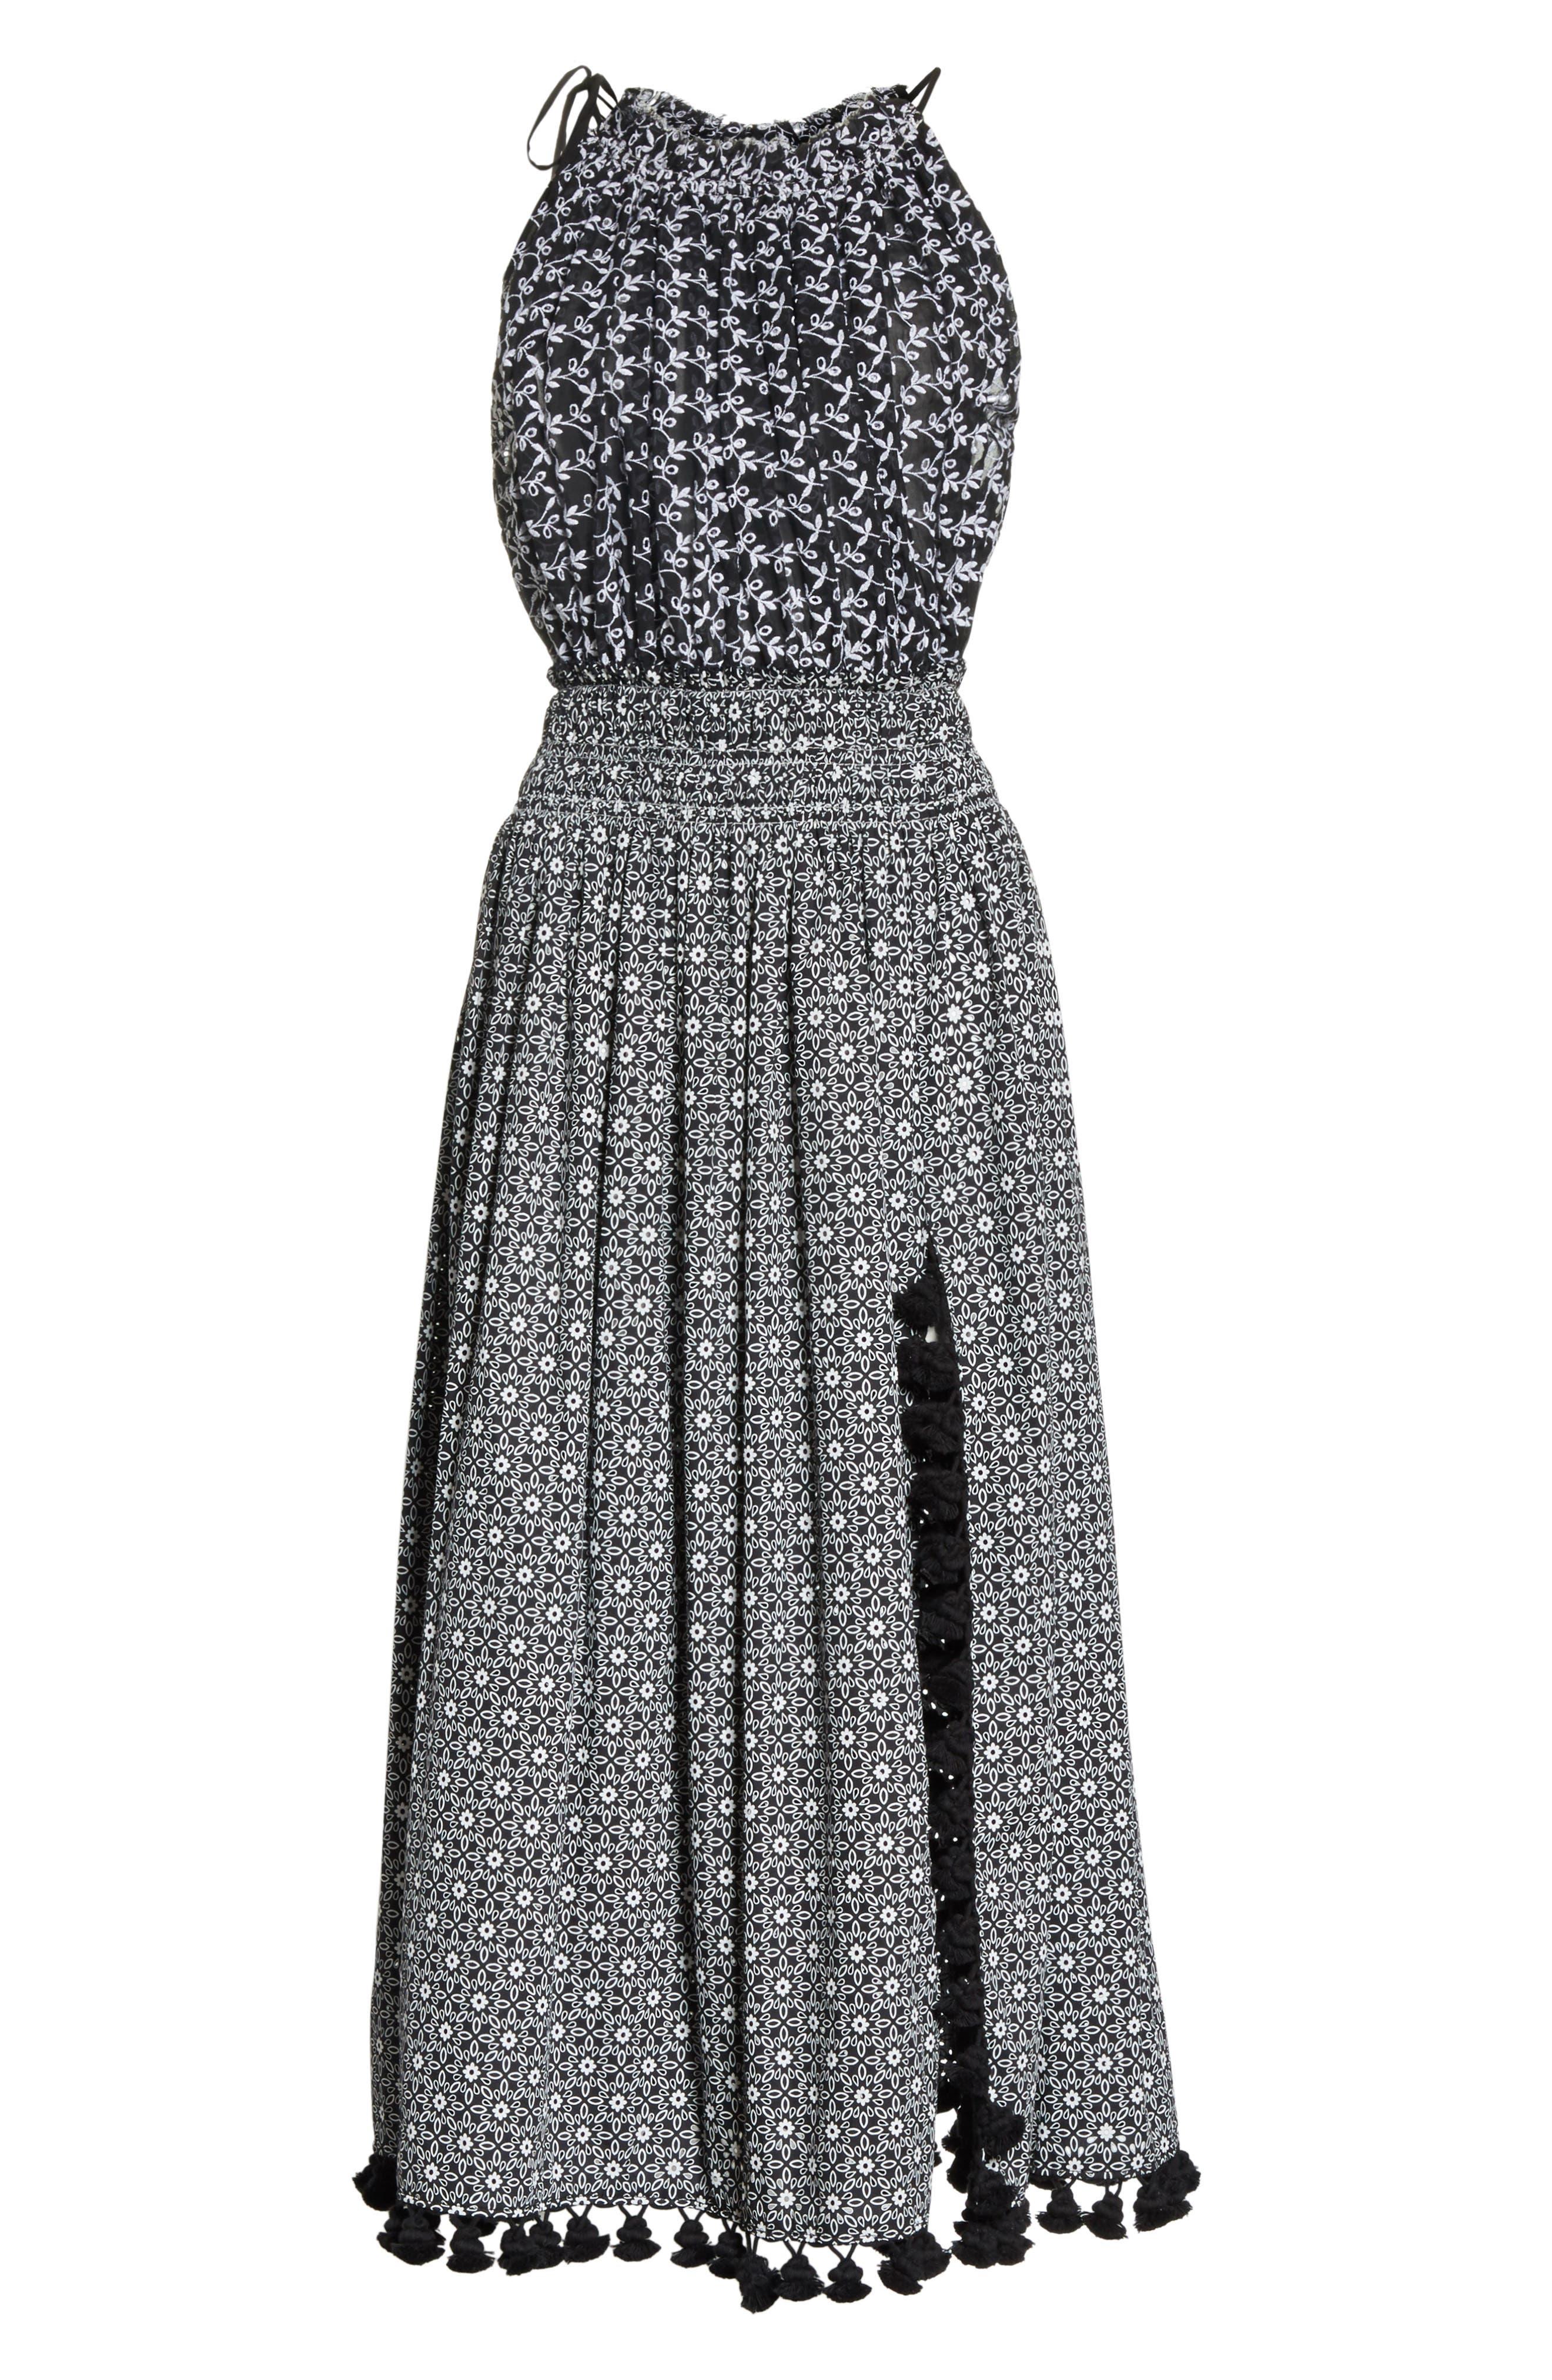 Pompom Trim Smock Waist Dress,                             Alternate thumbnail 8, color,                             Black